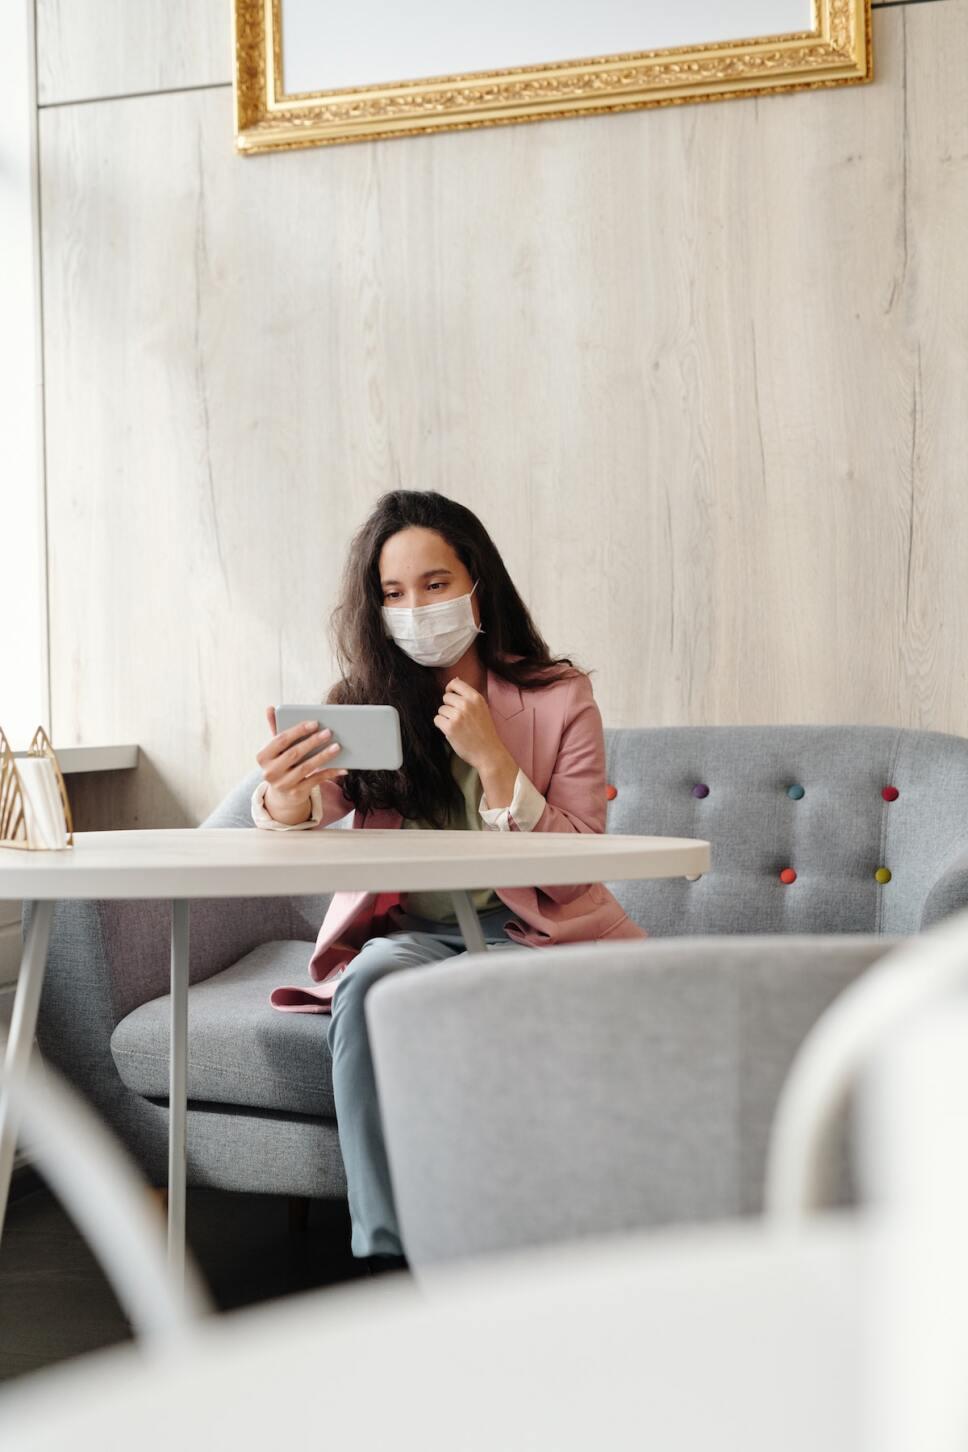 mujer vacunada en celular con cubrebocas